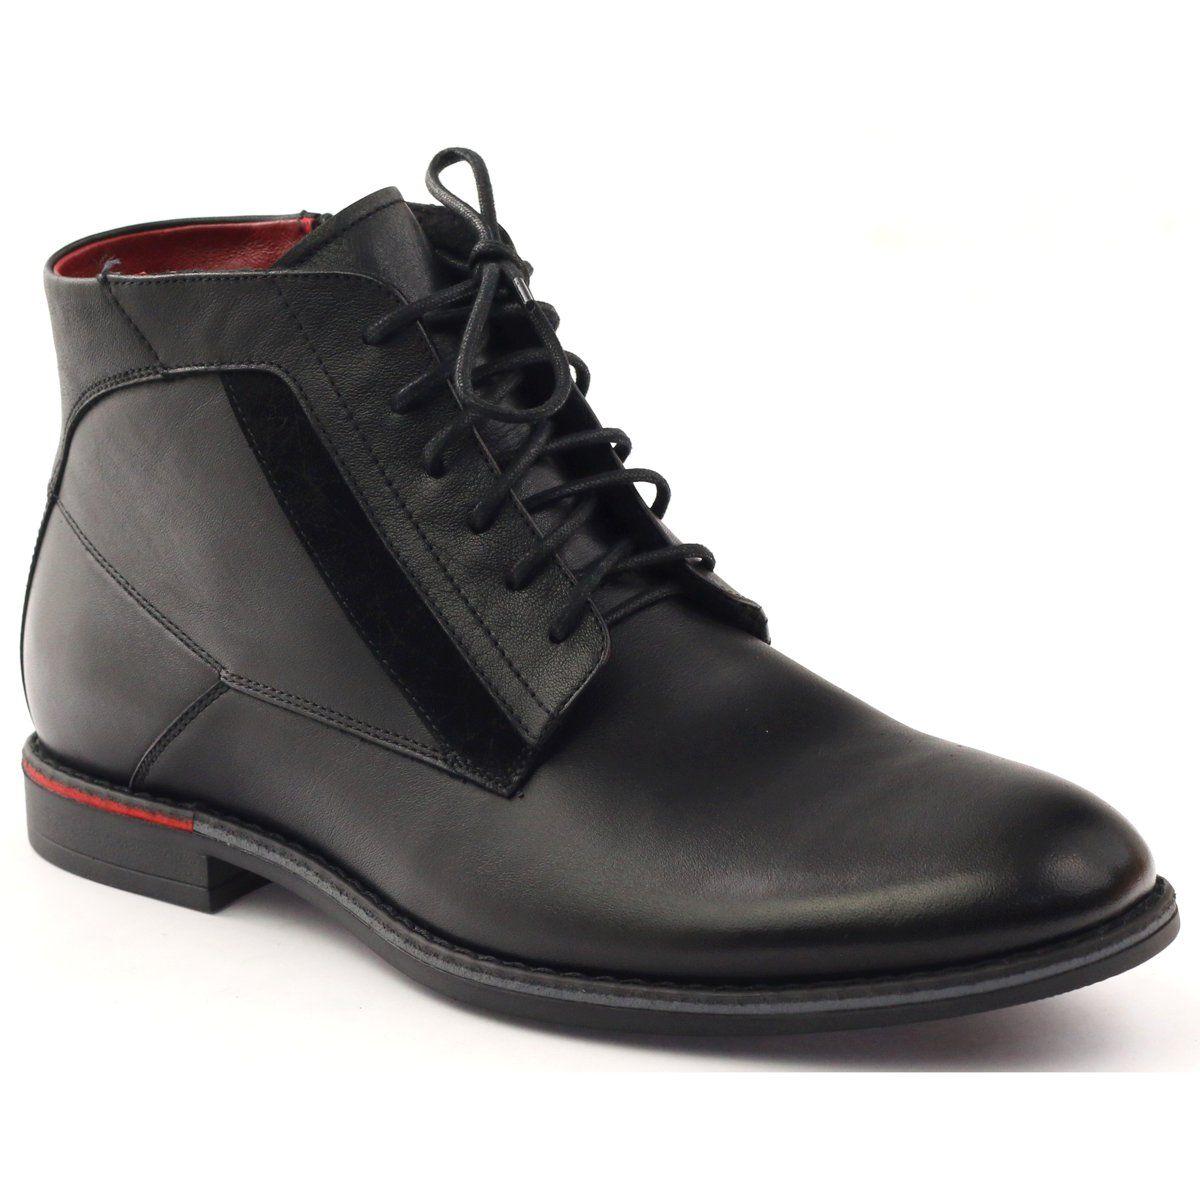 Botki Sztyblety Pilpol Pc6007 Czarne Boots Boots Men Winter Boots